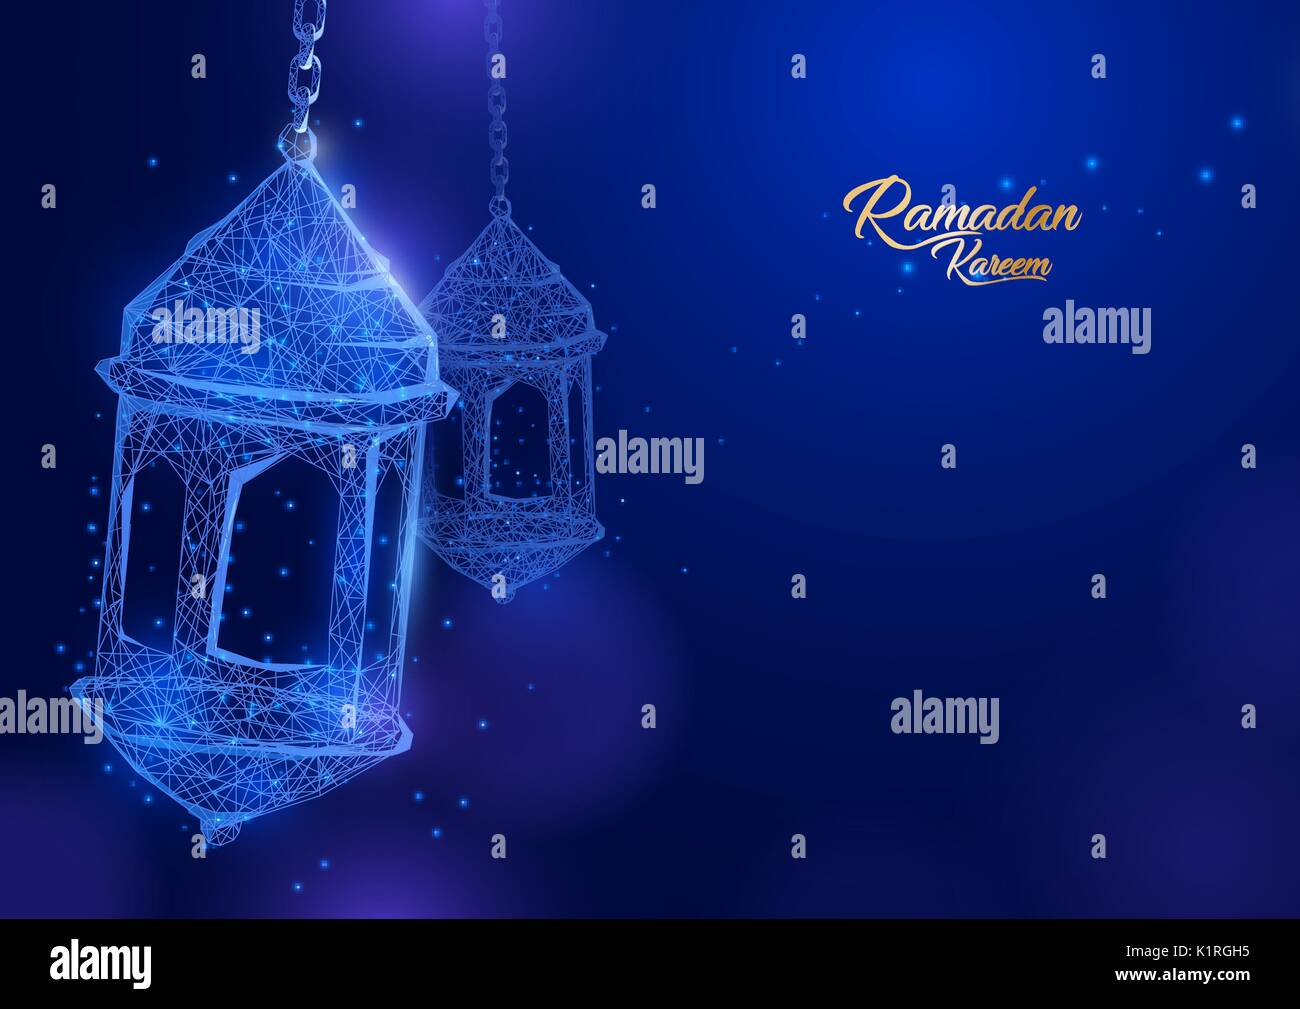 Must see Different Eid Al-Fitr Greeting - ramadan-lantern-form-of-a-starry-sky-eid-al-fitr-greeting-card-on-K1RGH5  HD_367118 .jpg